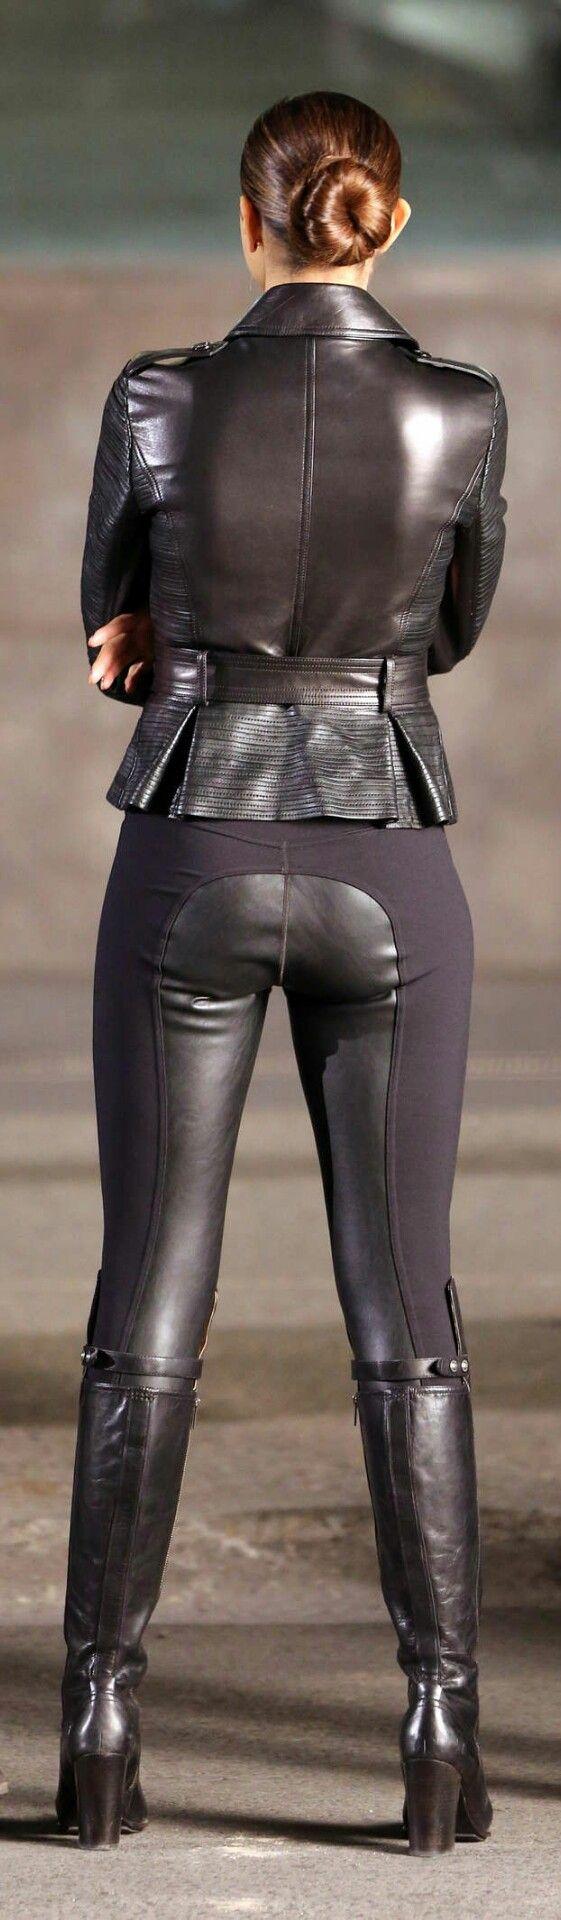 Leather jacket, leather jodhpurs, leather boots ...